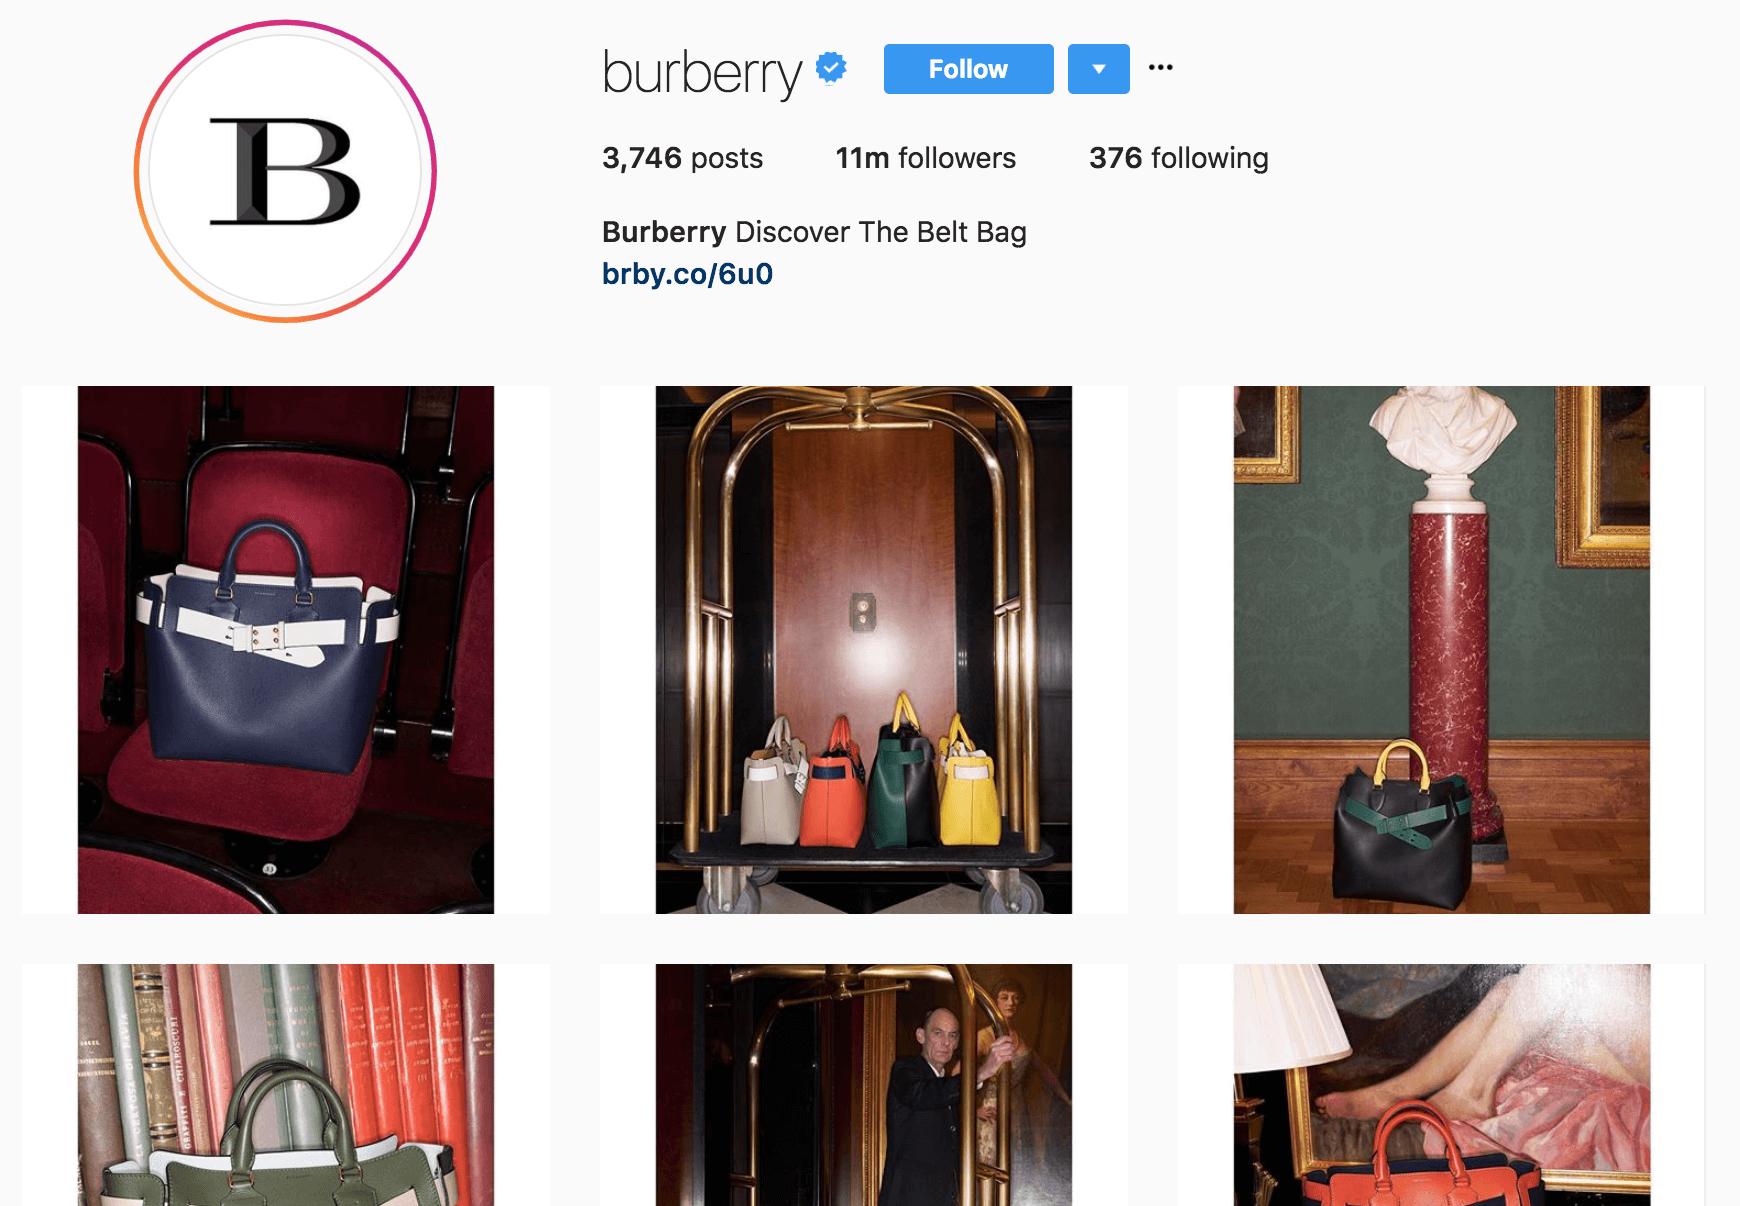 burberry instagram.png